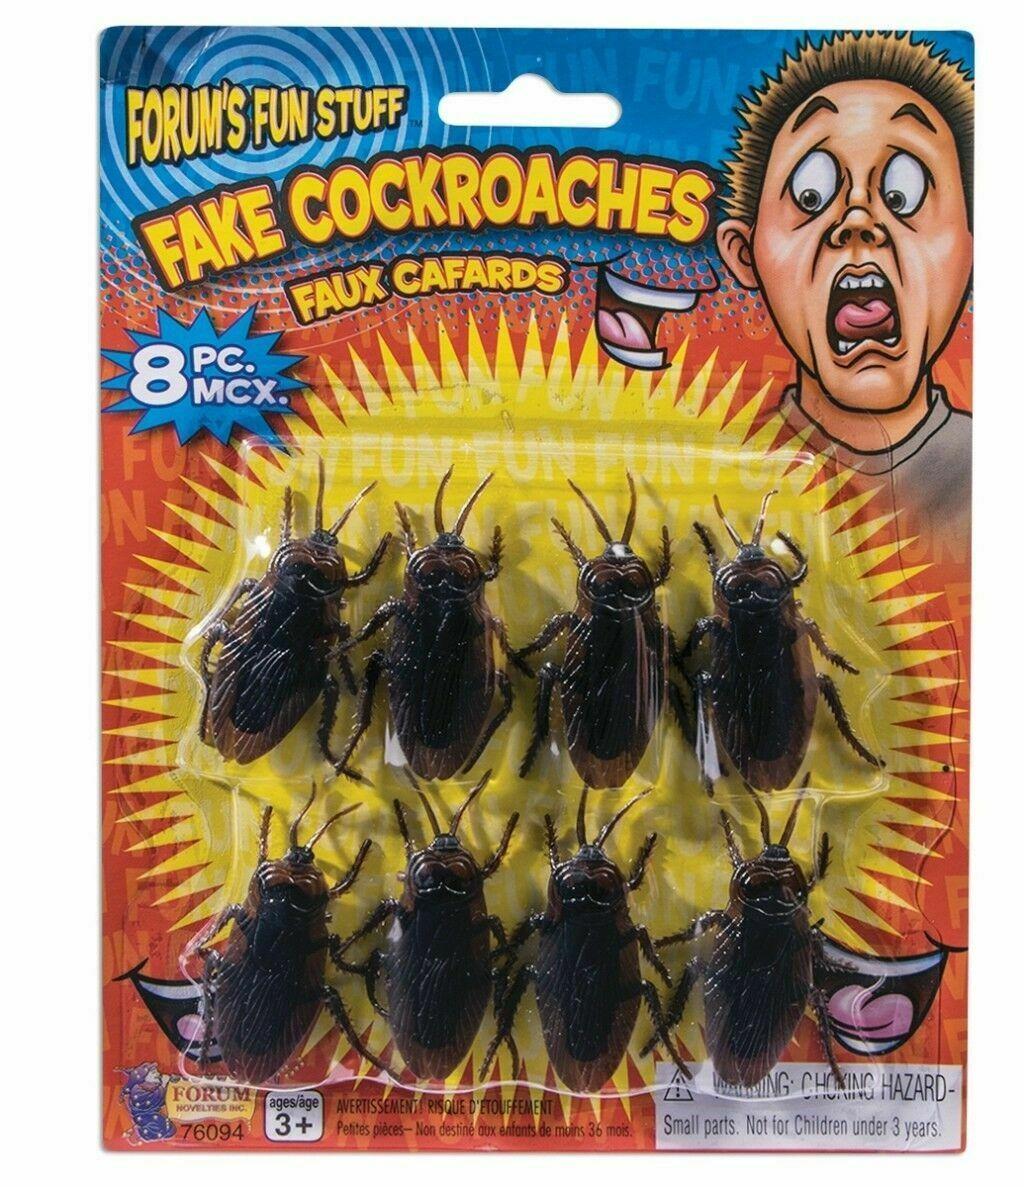 8 pc Fake Cockroaches Roach Bugs Scaring Prank Gross Halloween Trick Joke Prop